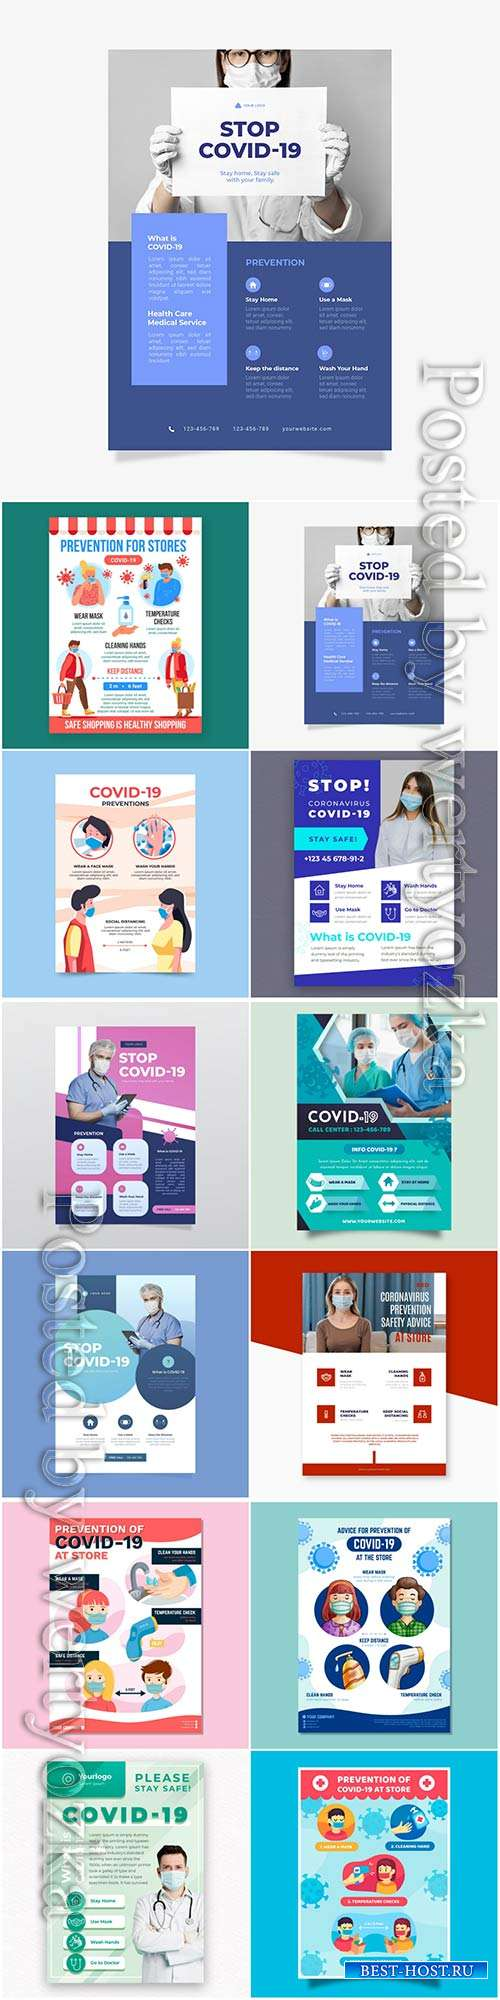 Realistic coronavirus vector background, stop covid-19 vol 5